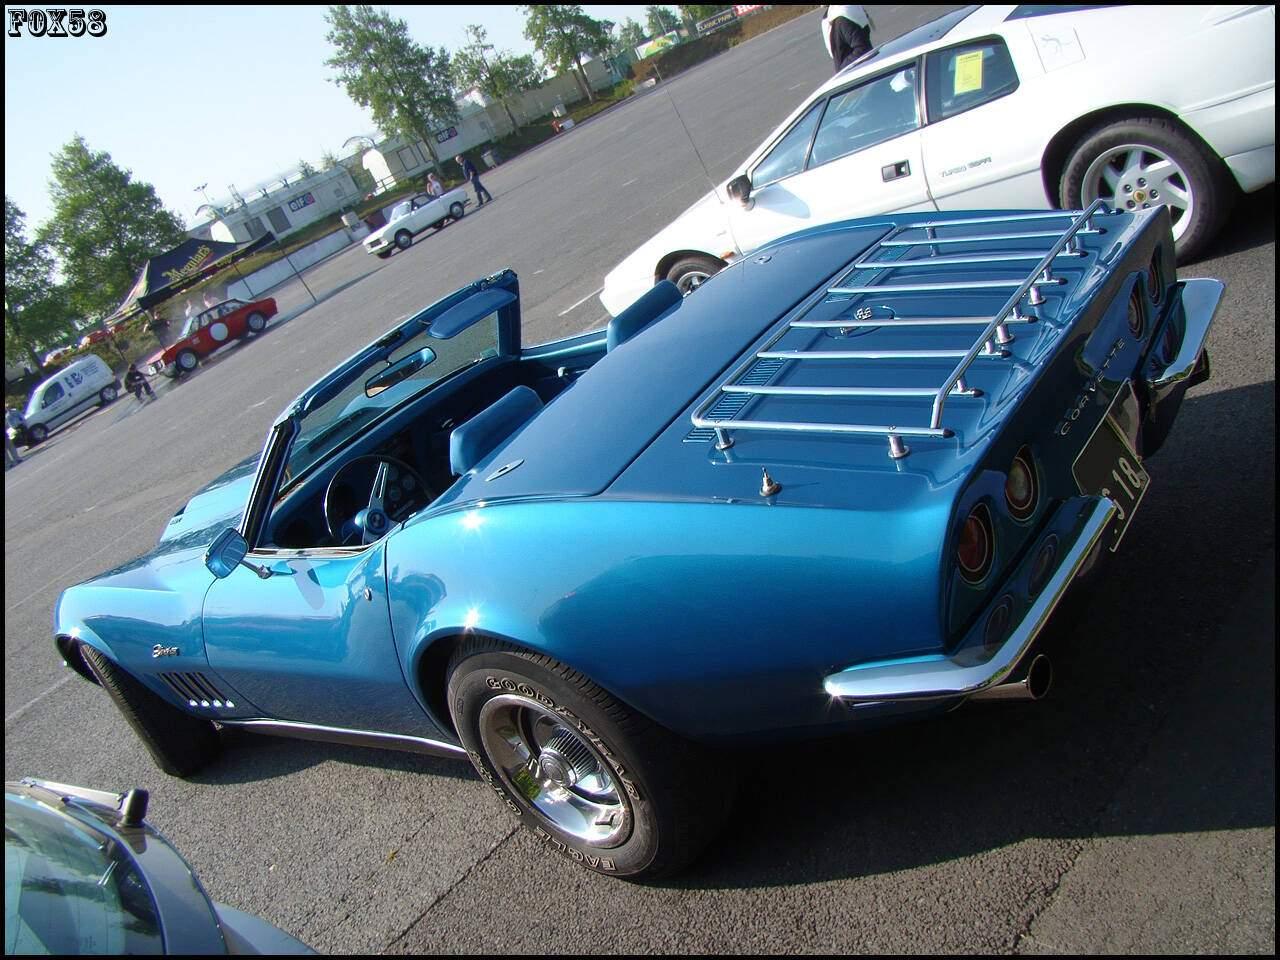 fiche technique chevrolet corvette c3 convertible 427ci 400 1968 1969. Black Bedroom Furniture Sets. Home Design Ideas